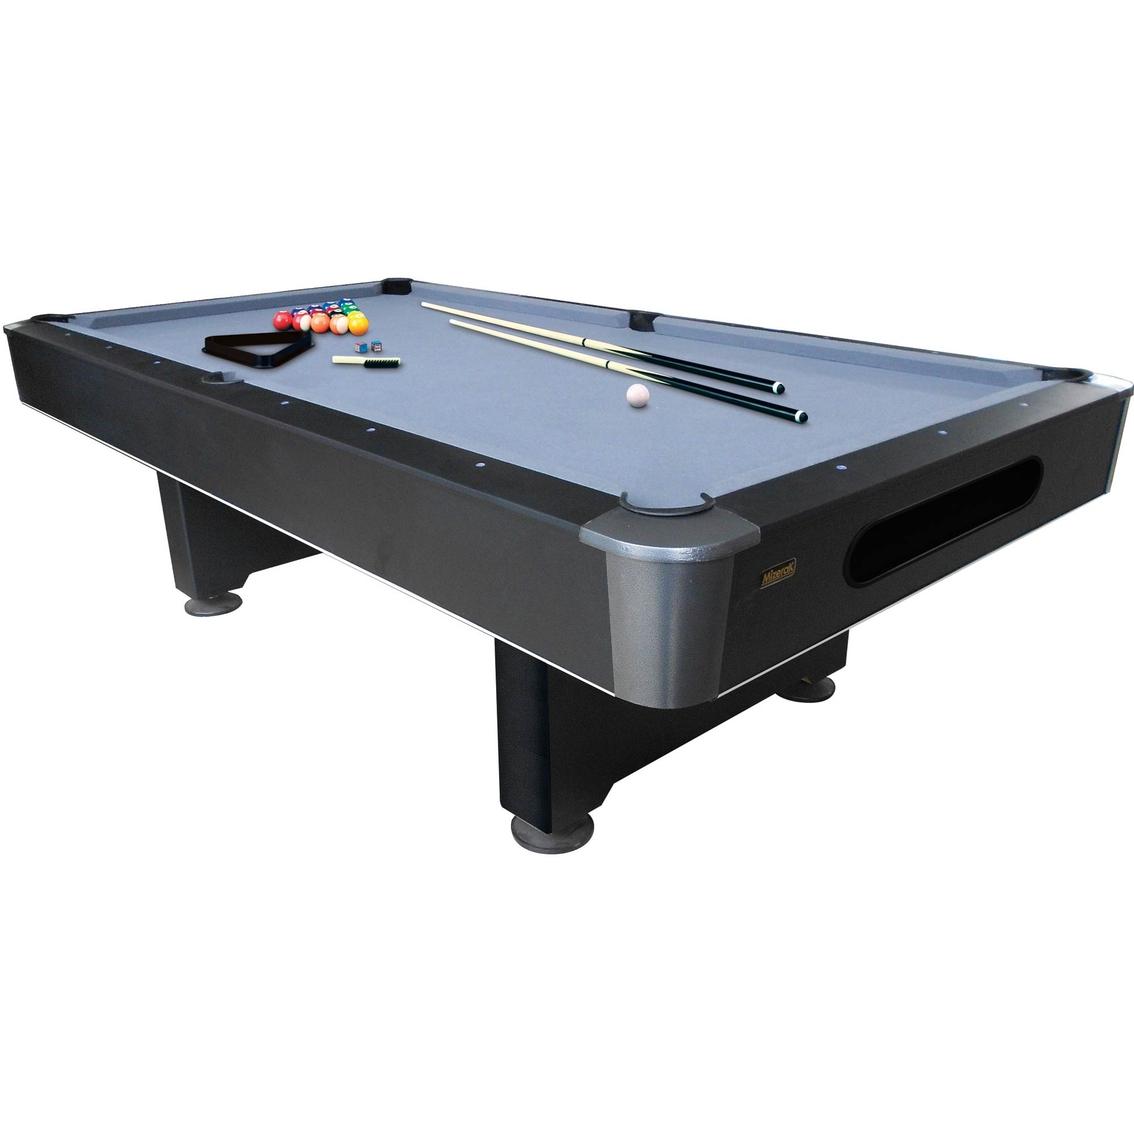 Mizerak 8 Ft. Pool Table